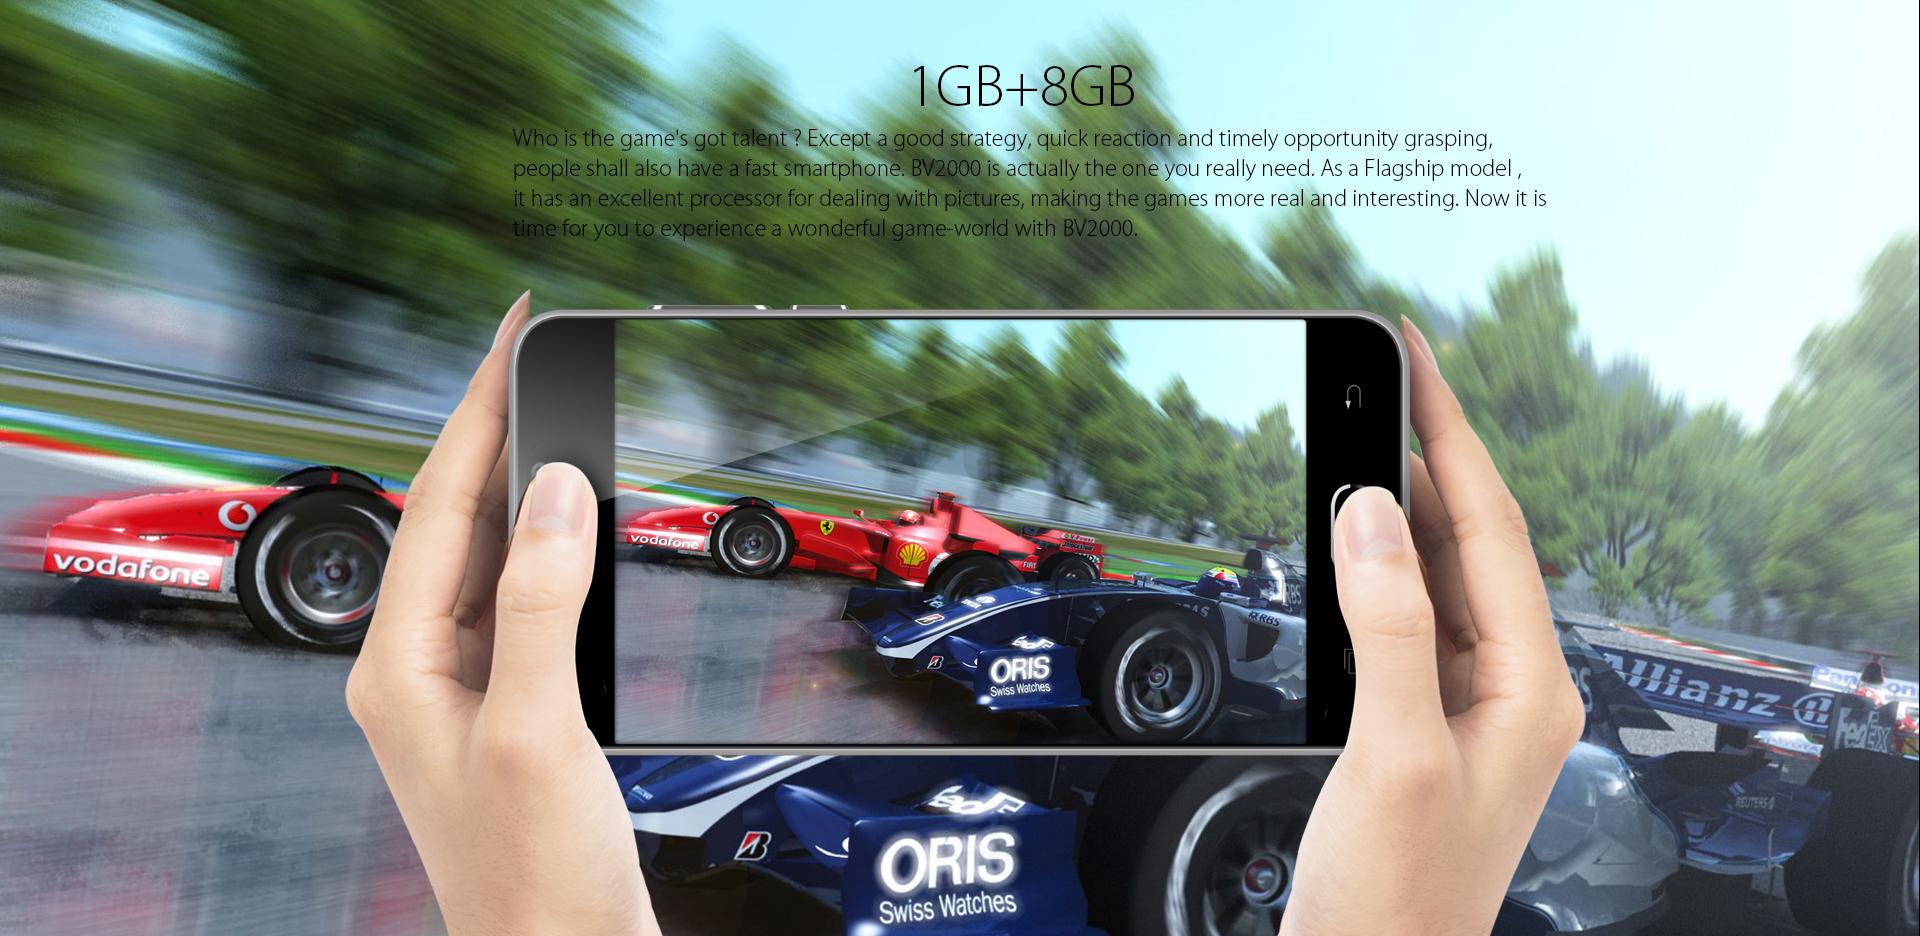 Blackview Bv2000 Xiaomi Redmi Note 2 4g Lte Dual Simcard Ram 1gb Internal 8gb